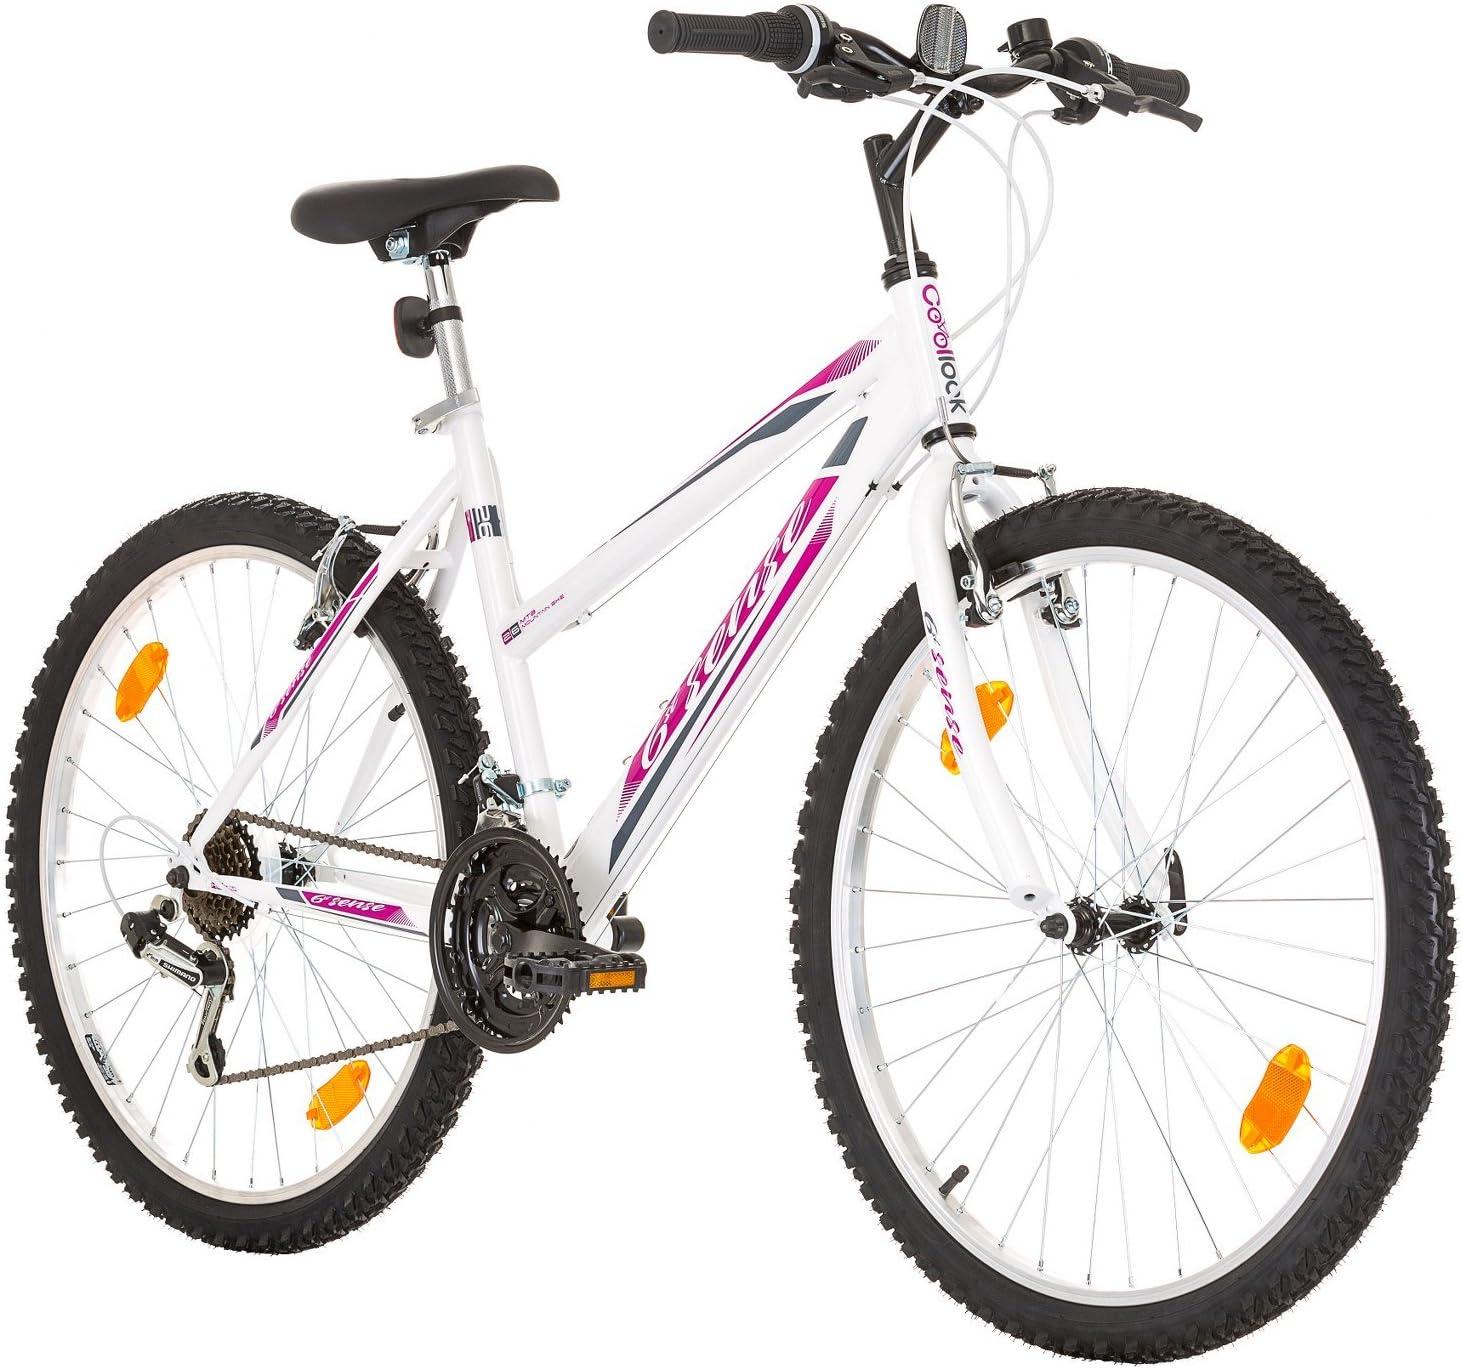 Multibrand, PROBIKE 6th SENSE, 460 mm, 26 pulgadas, Mountain Bike, 18 velocidades, Set de Mudgard, Para mujeres, Blanco-Rosa (Blanco-Rosa (Shimano))